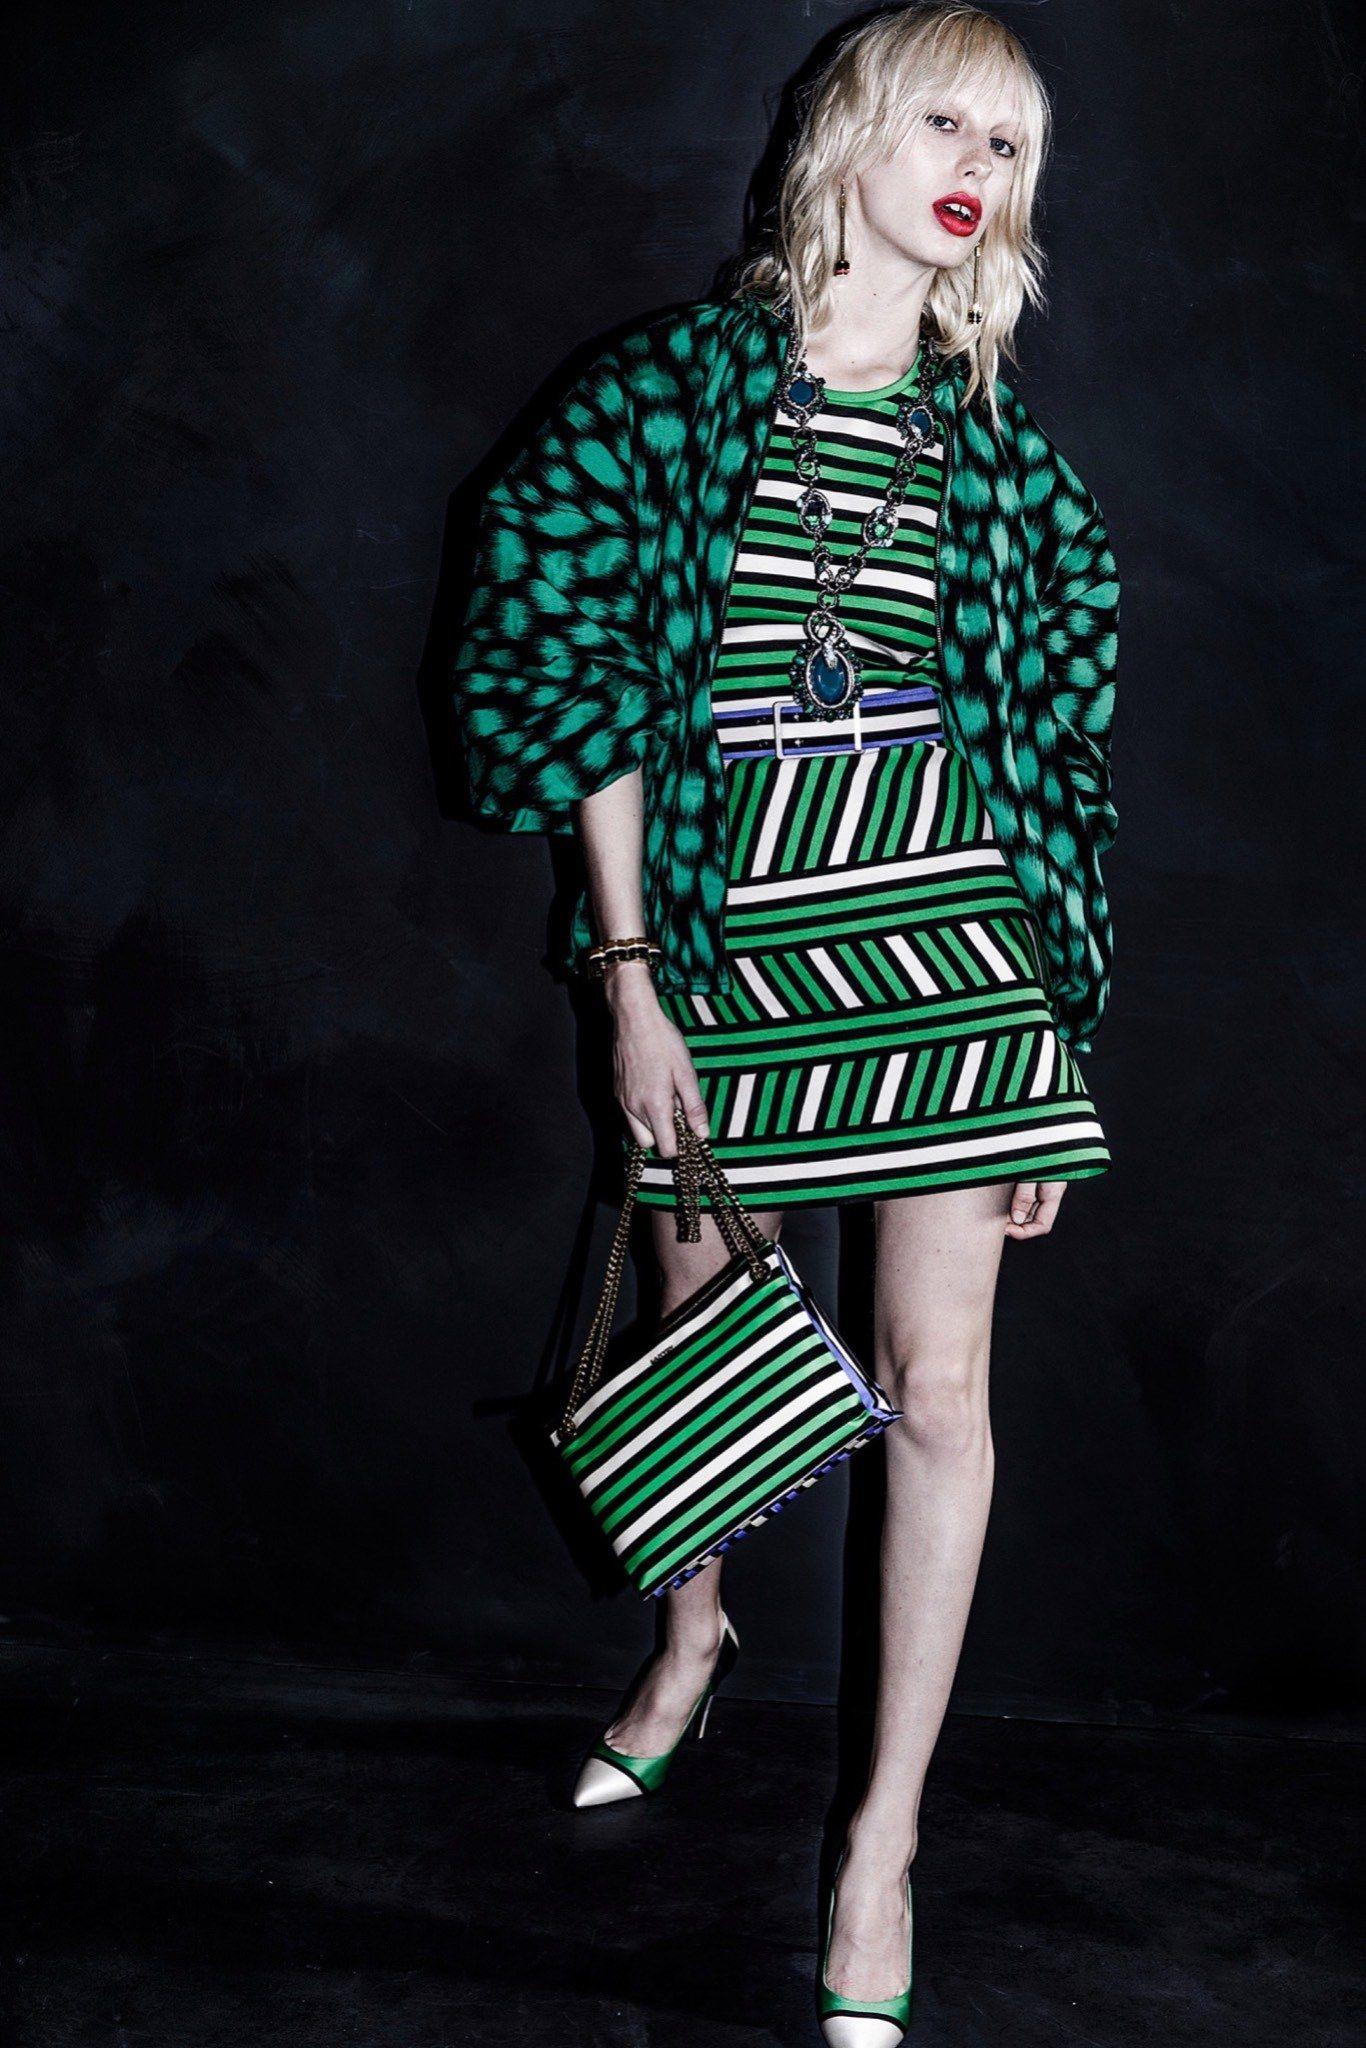 Lanvin Resort 2016 Fashion Show - Lili Sumner